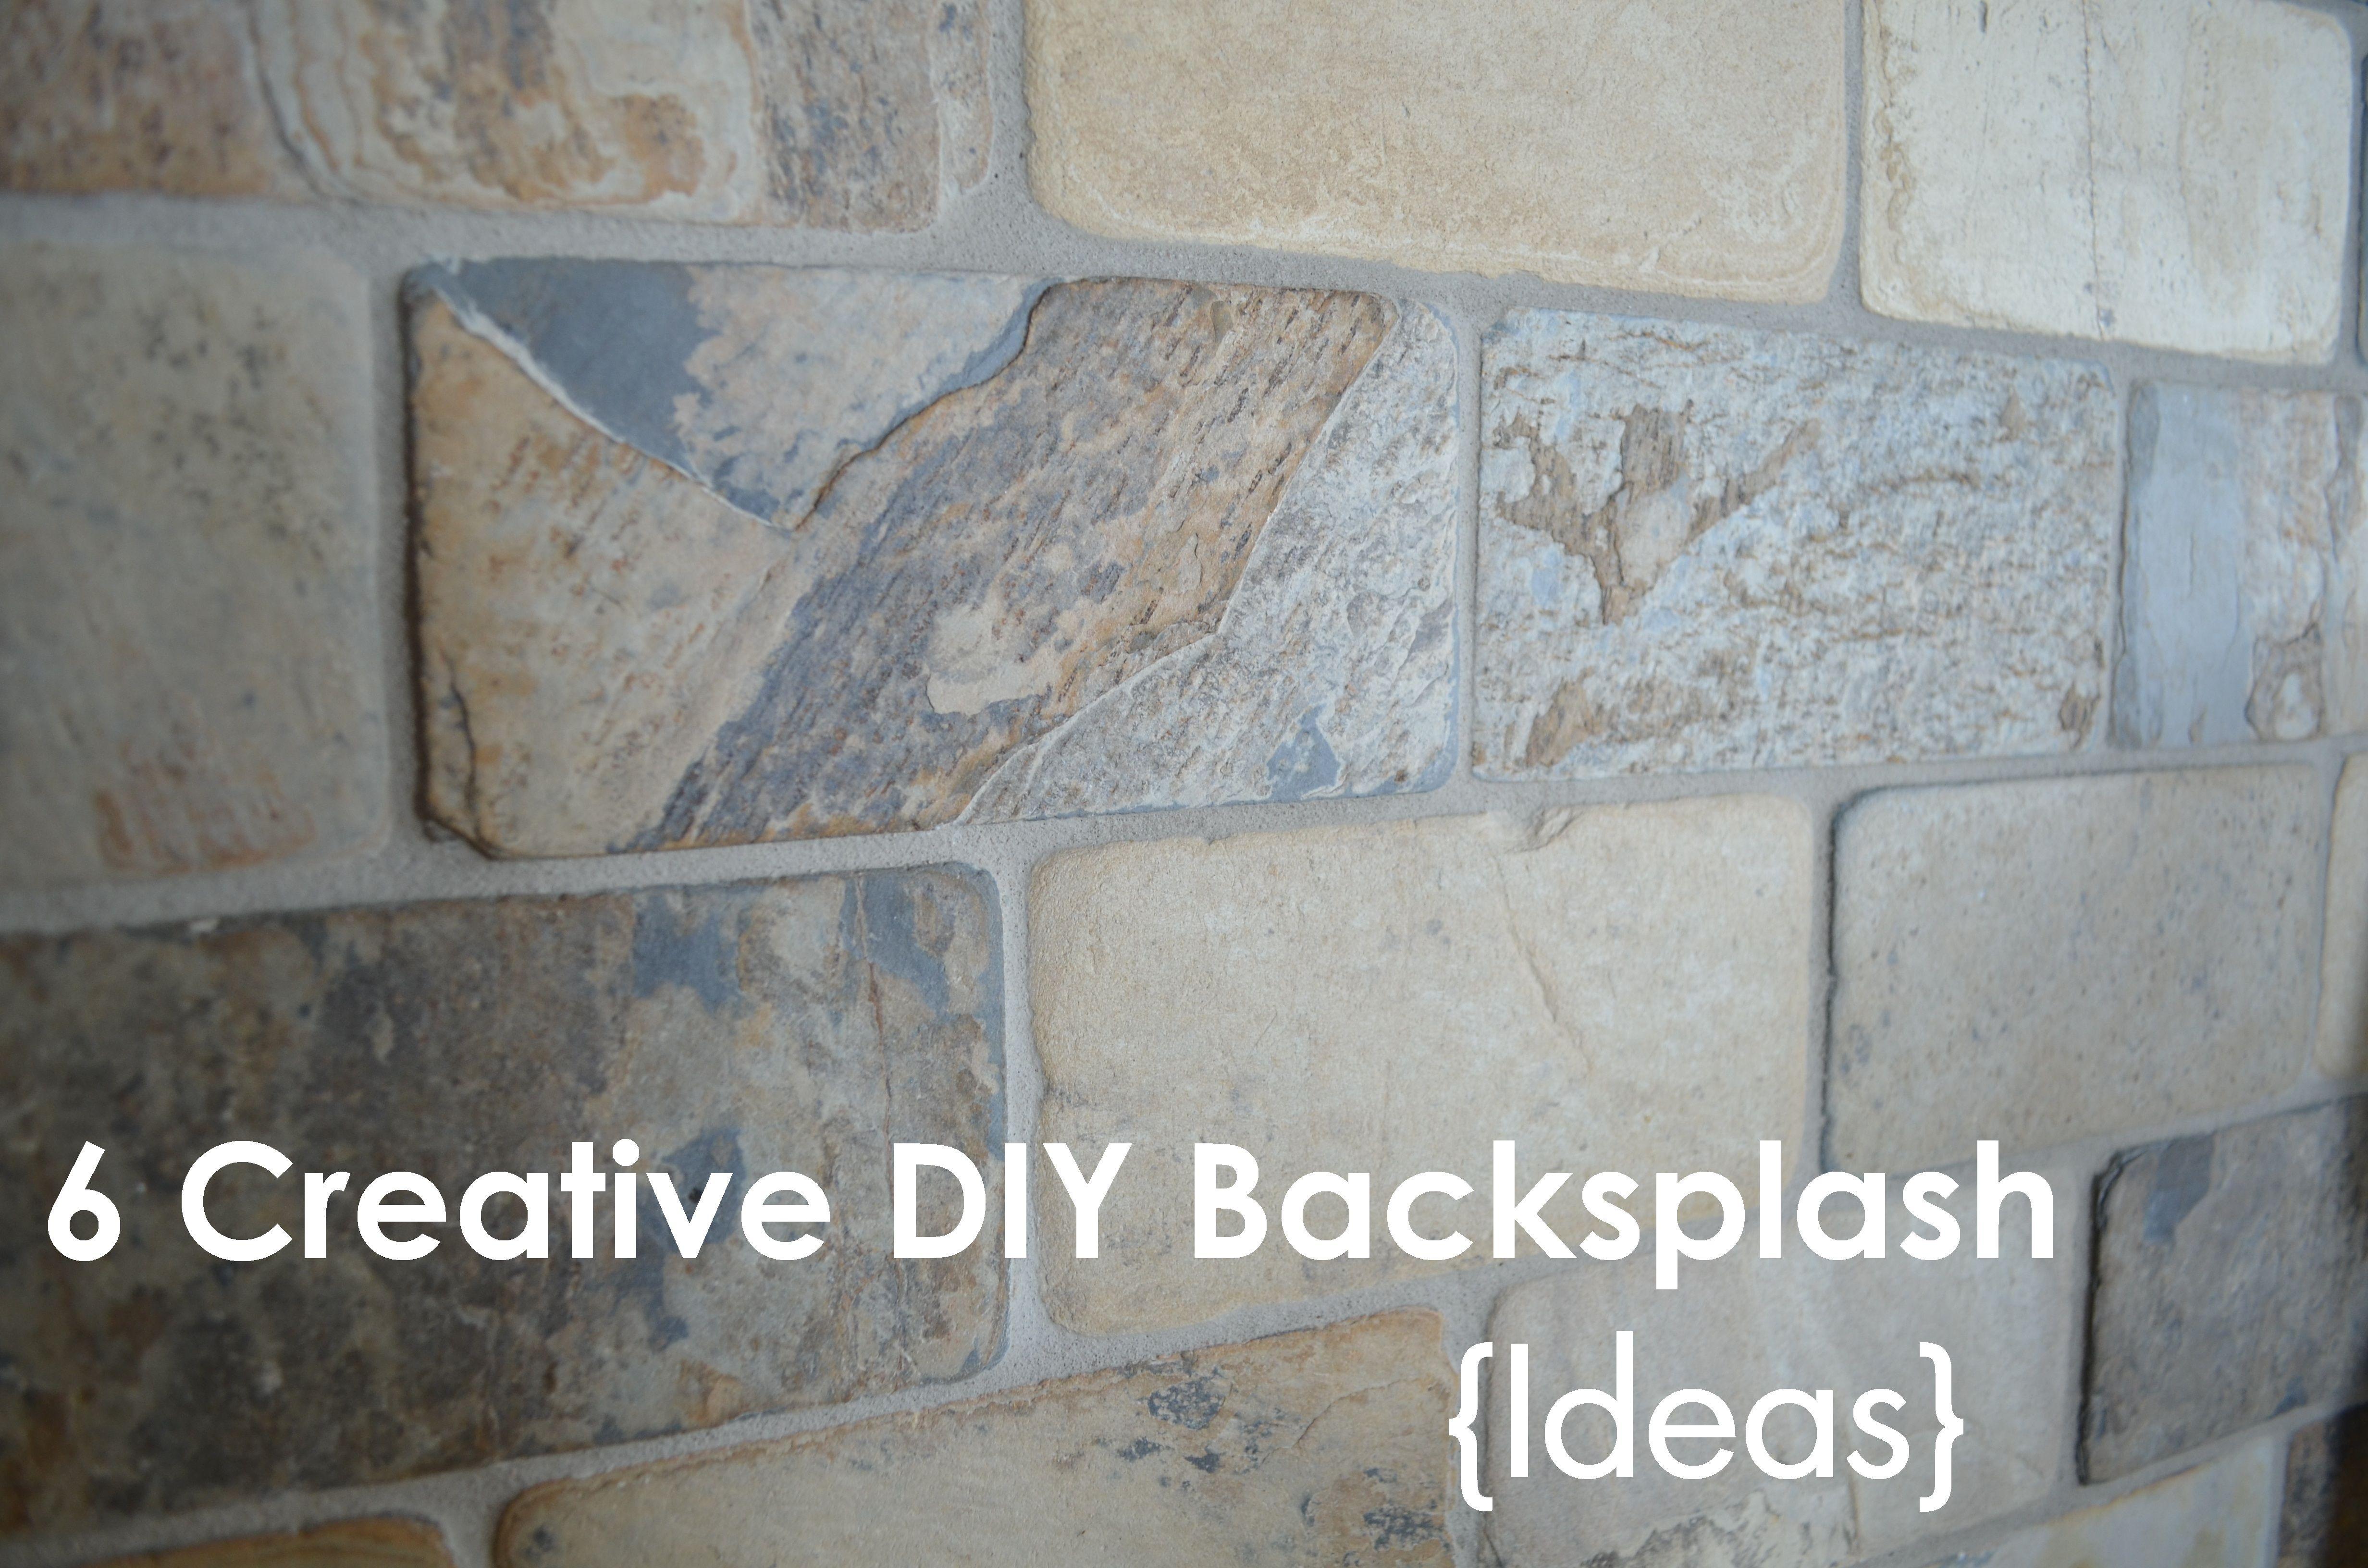 6 Backsplash Ideas 1 Beadboard 2 Subway Tile 3 L And Stick 4 Board Batten 5 Diy Brick Wallpaper